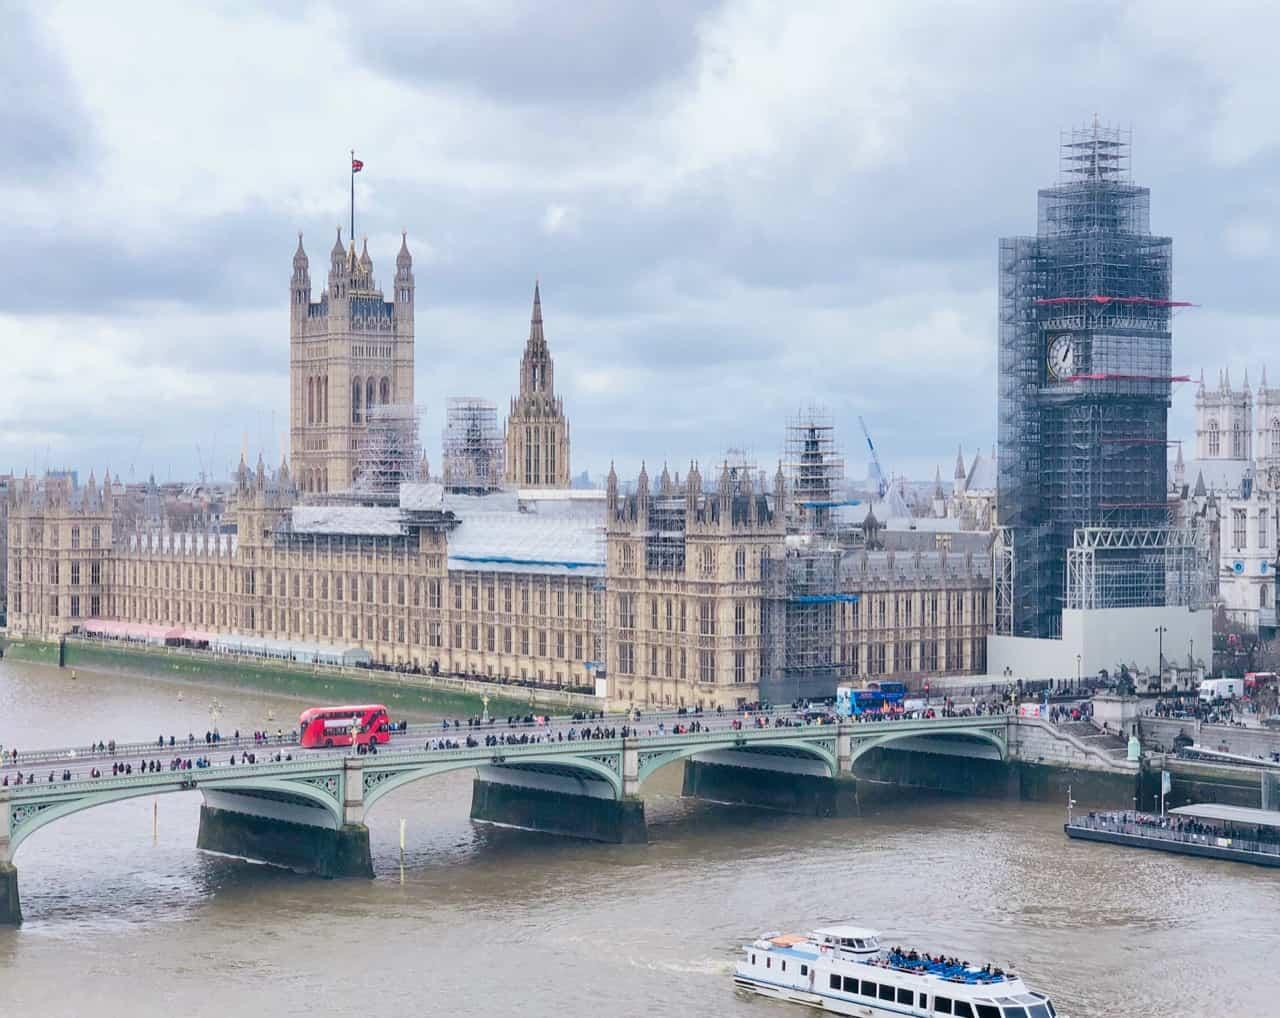 https://anysizedealsweek.com/wp-content/uploads/2020/07/Westminster-Parliament-London-UK.jpg